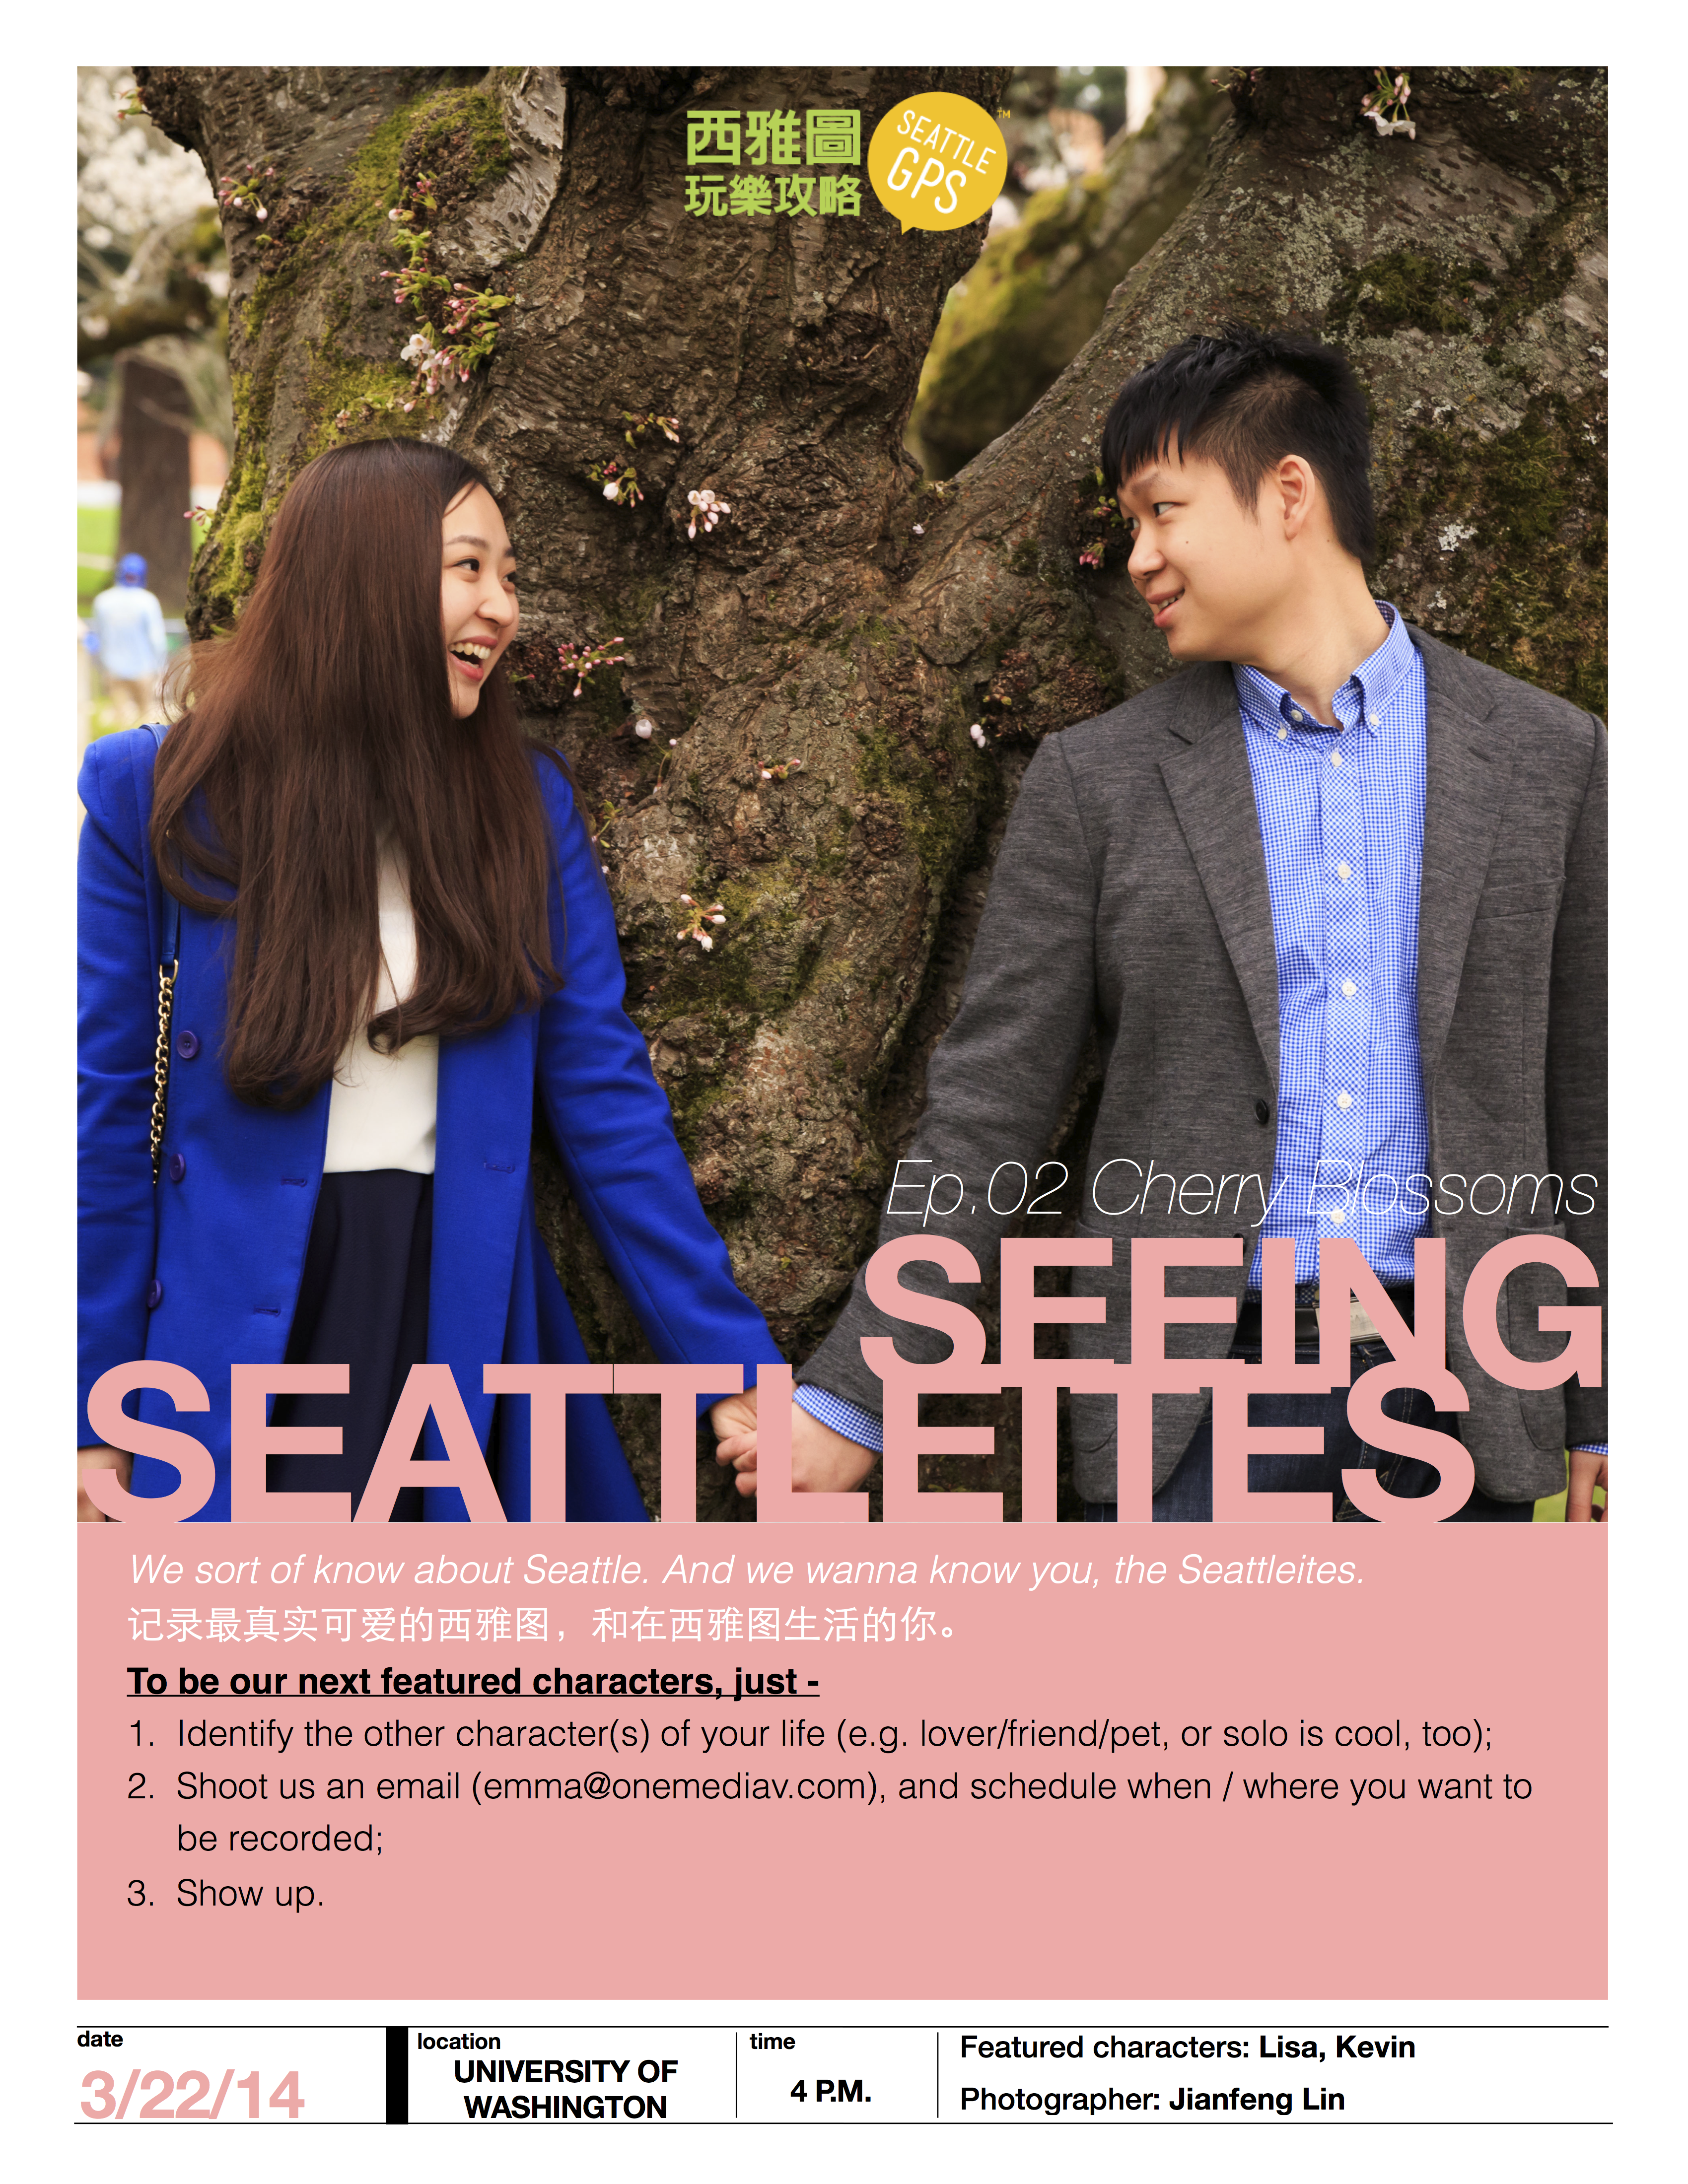 Seeing Seattleites_cherry